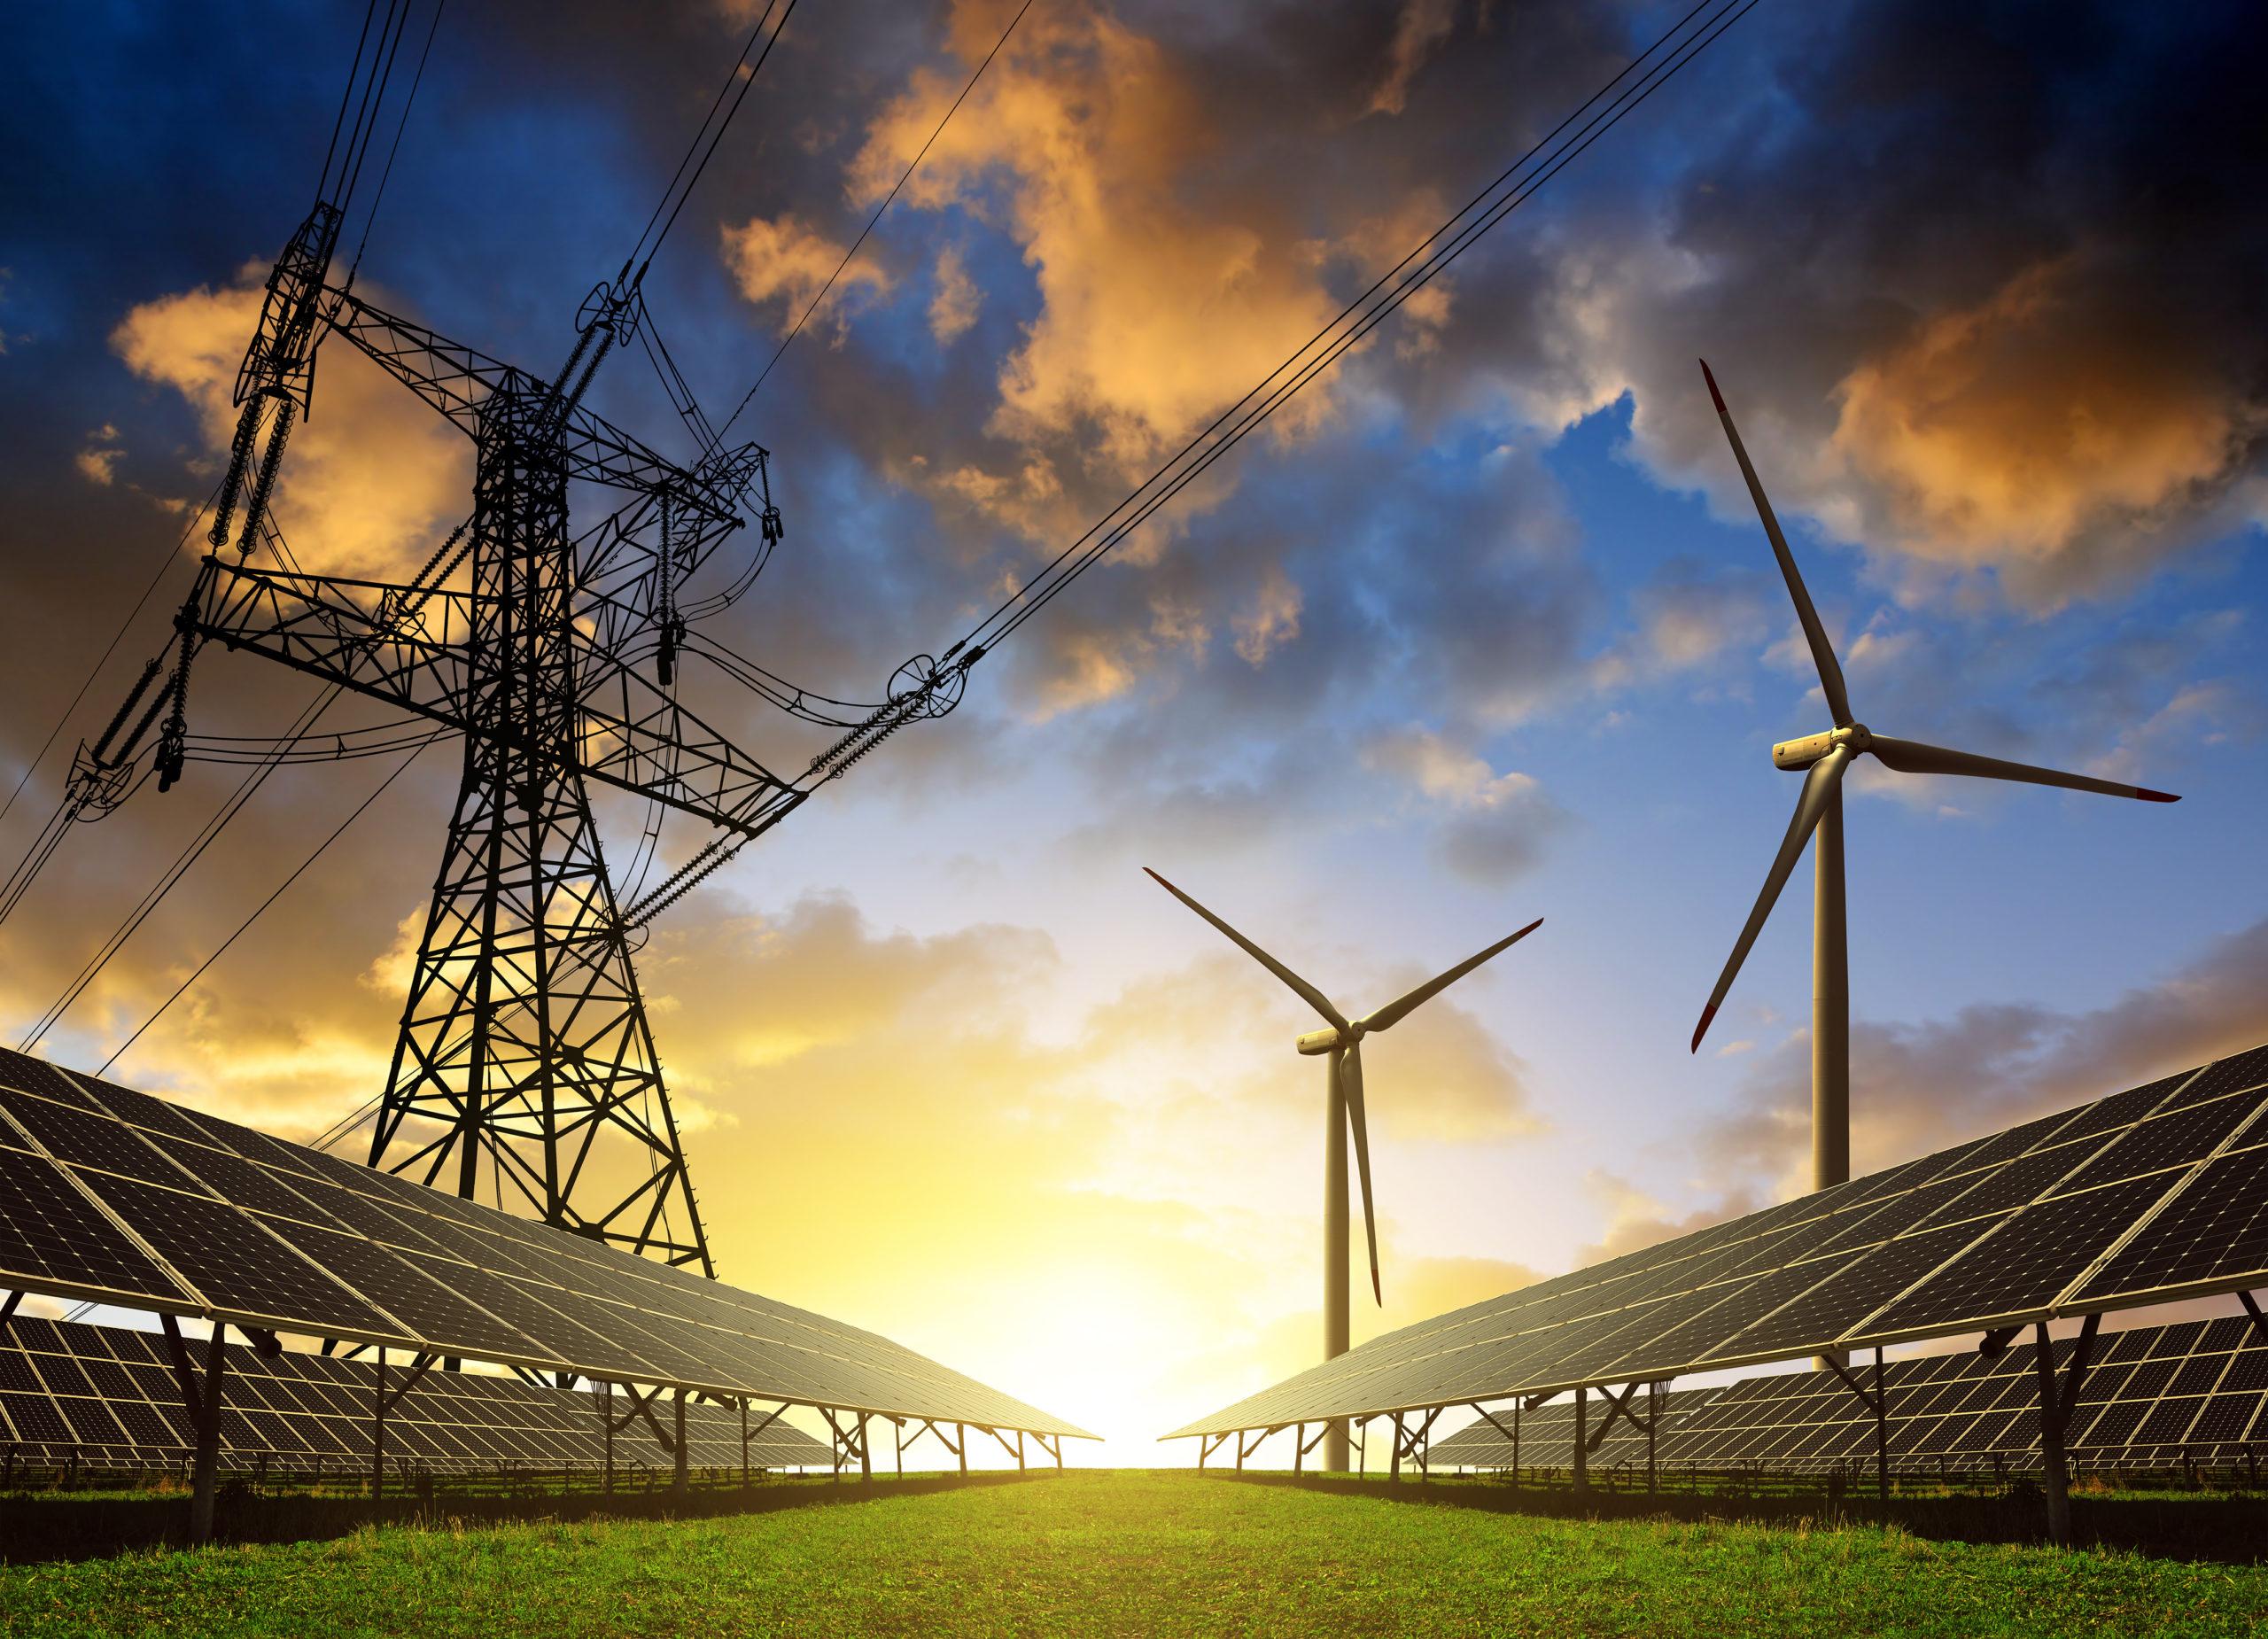 Futurist Speaker Thomas Frey Blog: Rooftop Solar Technology Addresses Increasing Electrification and  Minimizes Carbon Emissions